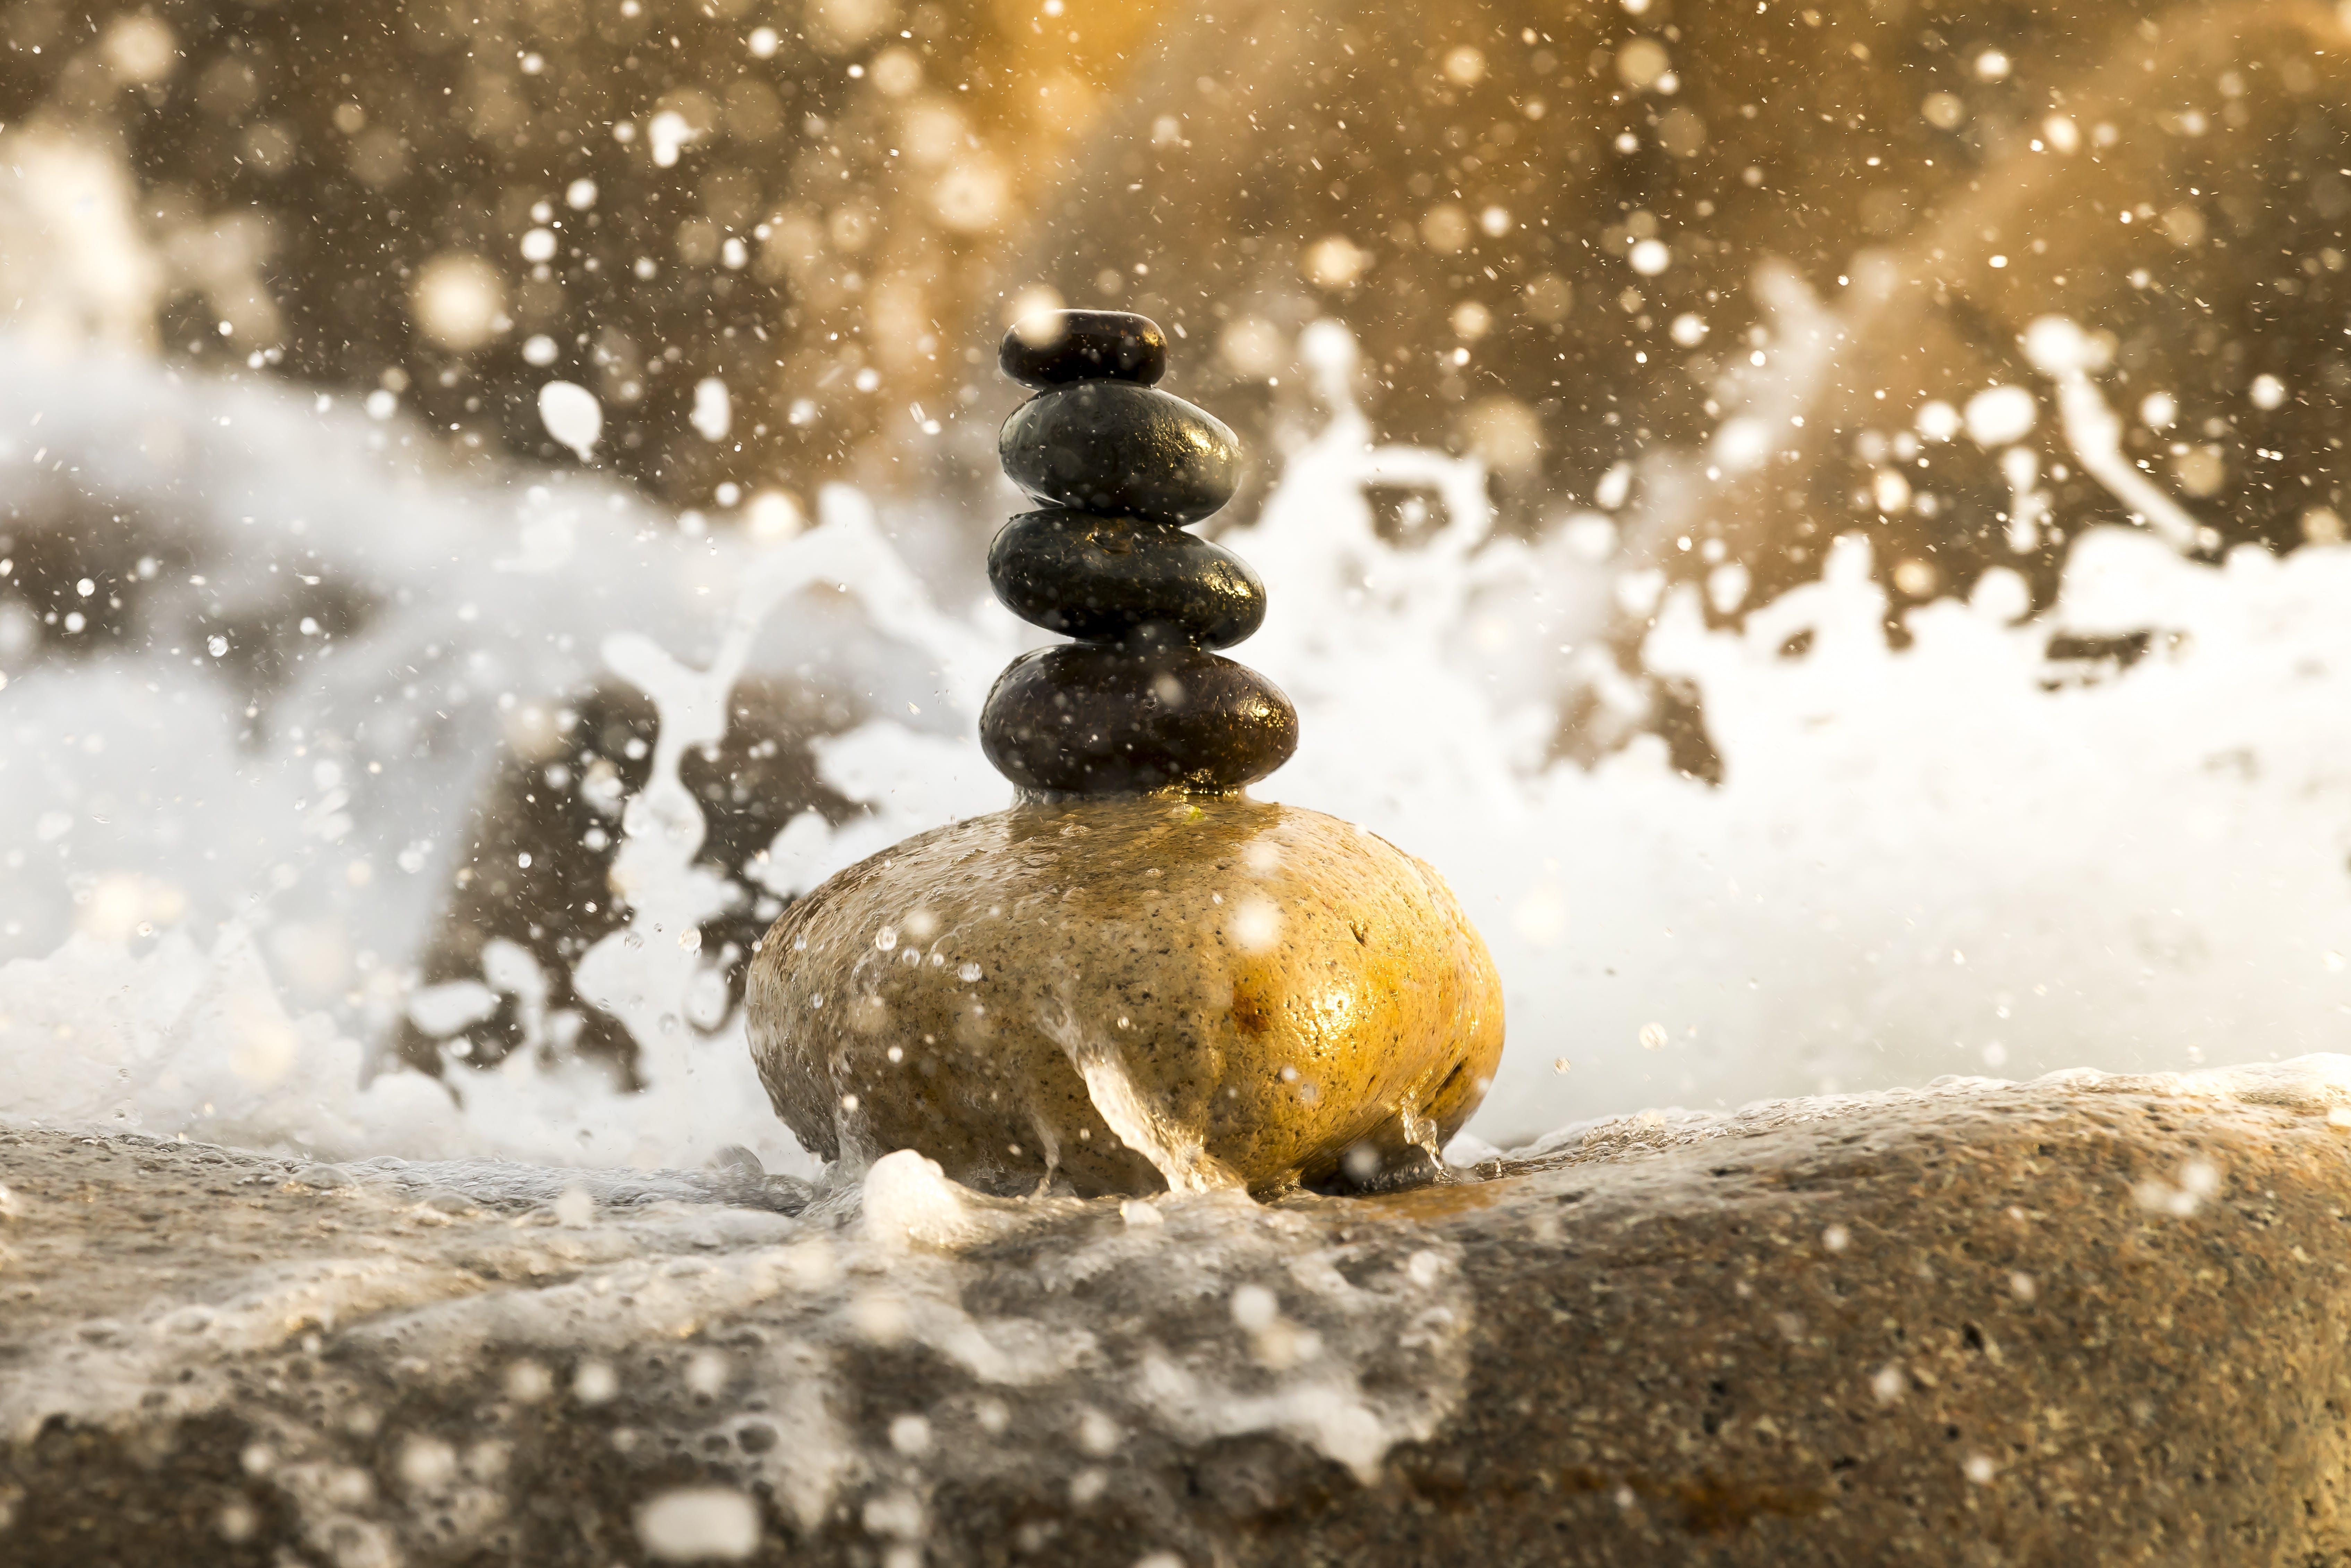 Fotos de stock gratuitas de agua, amontonados, balance, húmedo